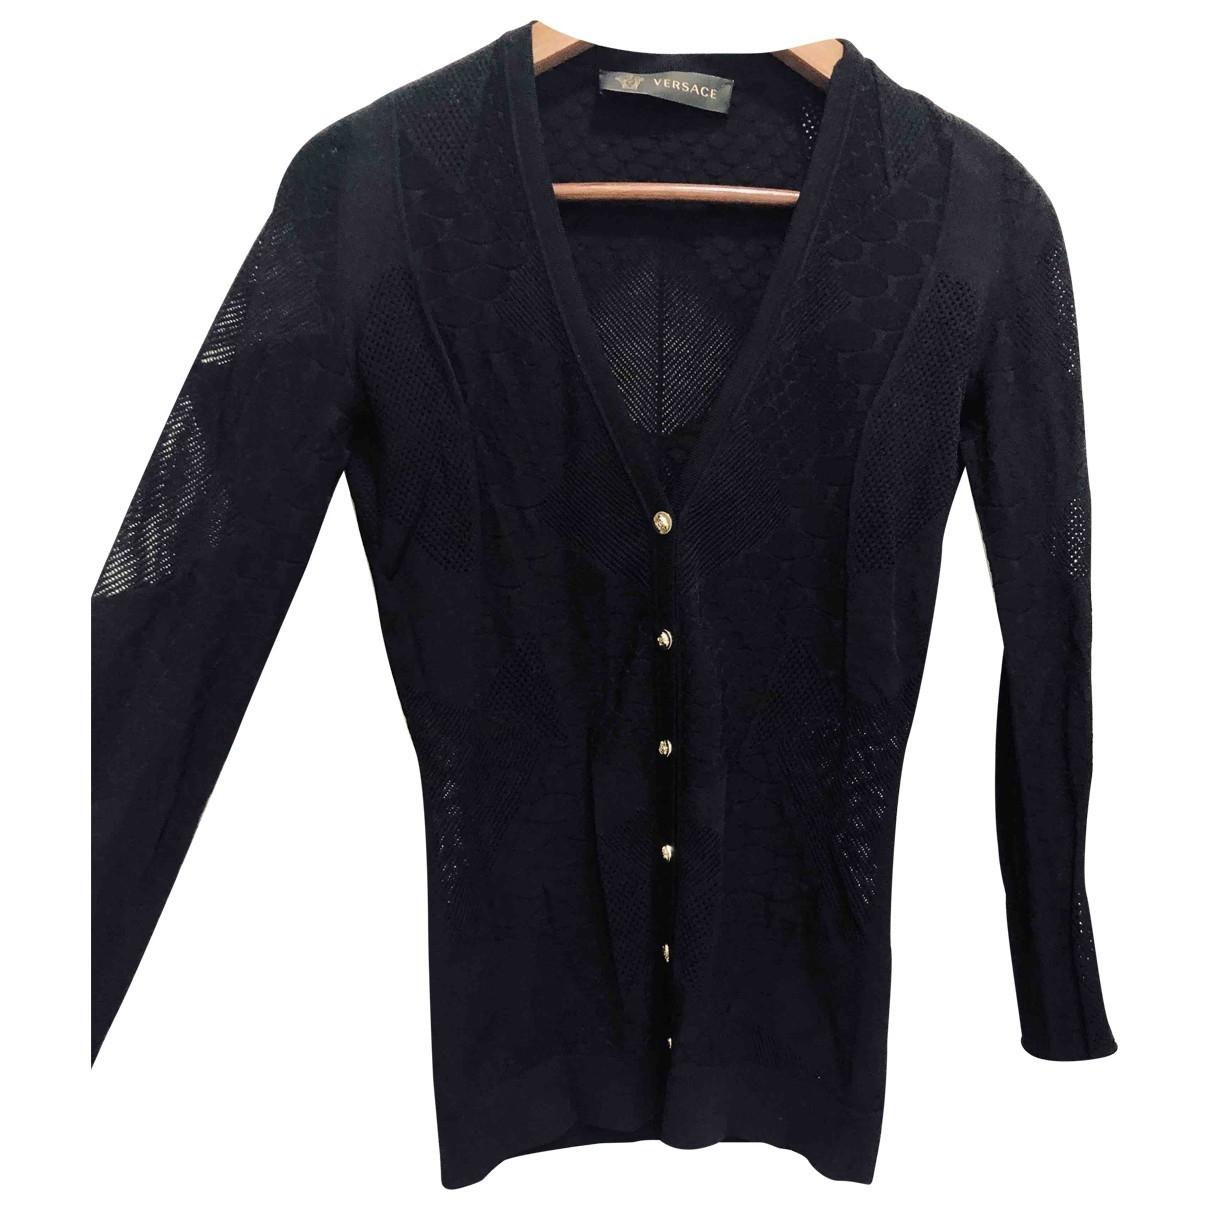 Versace \N Black  top for Women 38 IT